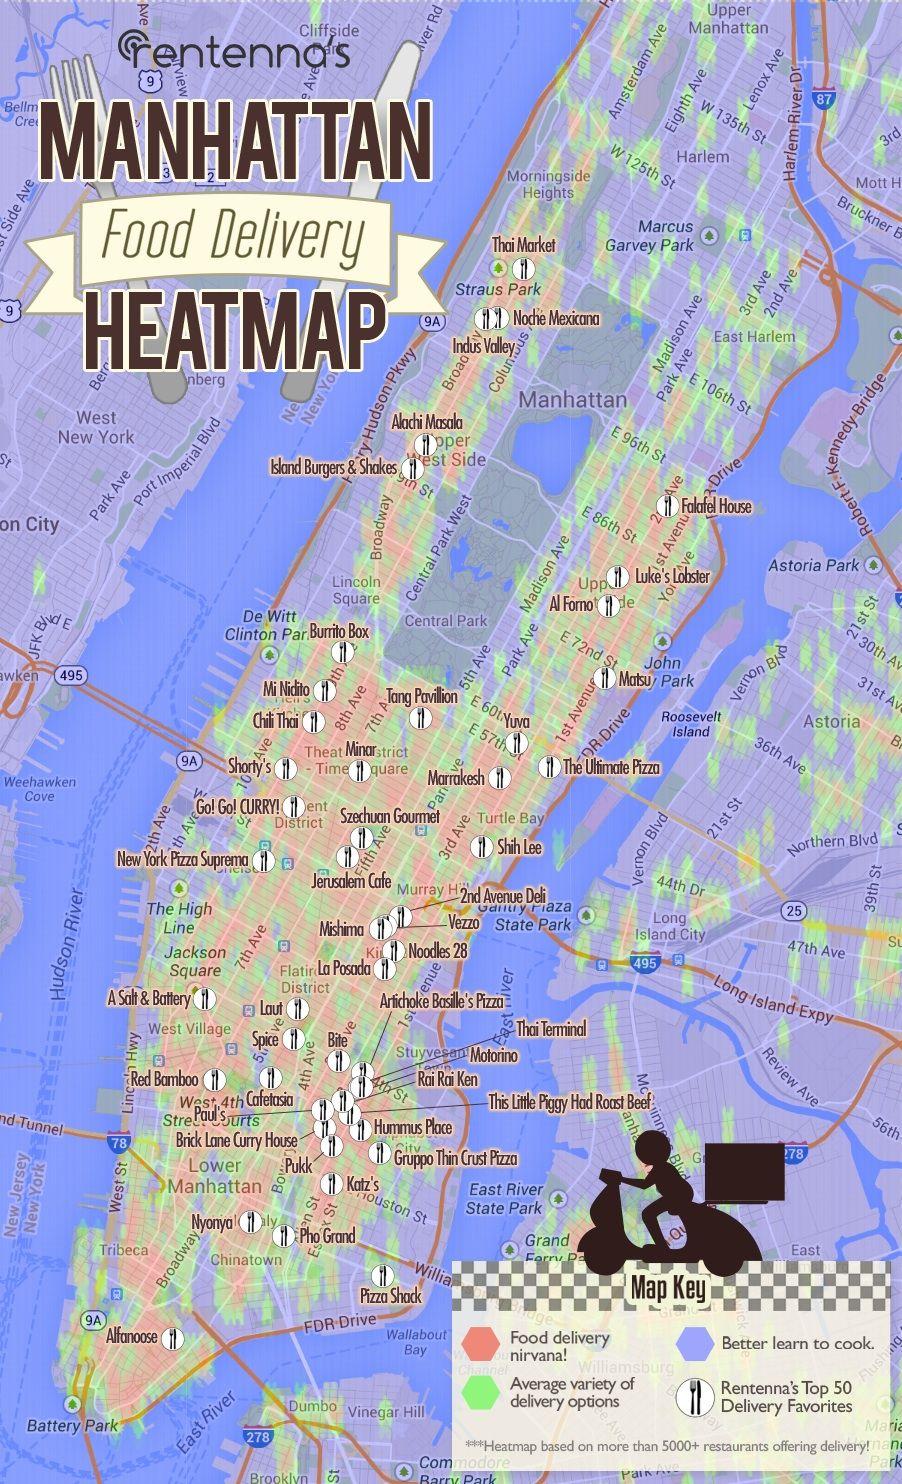 Manhattan Food Delivery Heatmap By Wwwrentennacom Via Http - Nyc unfolds map